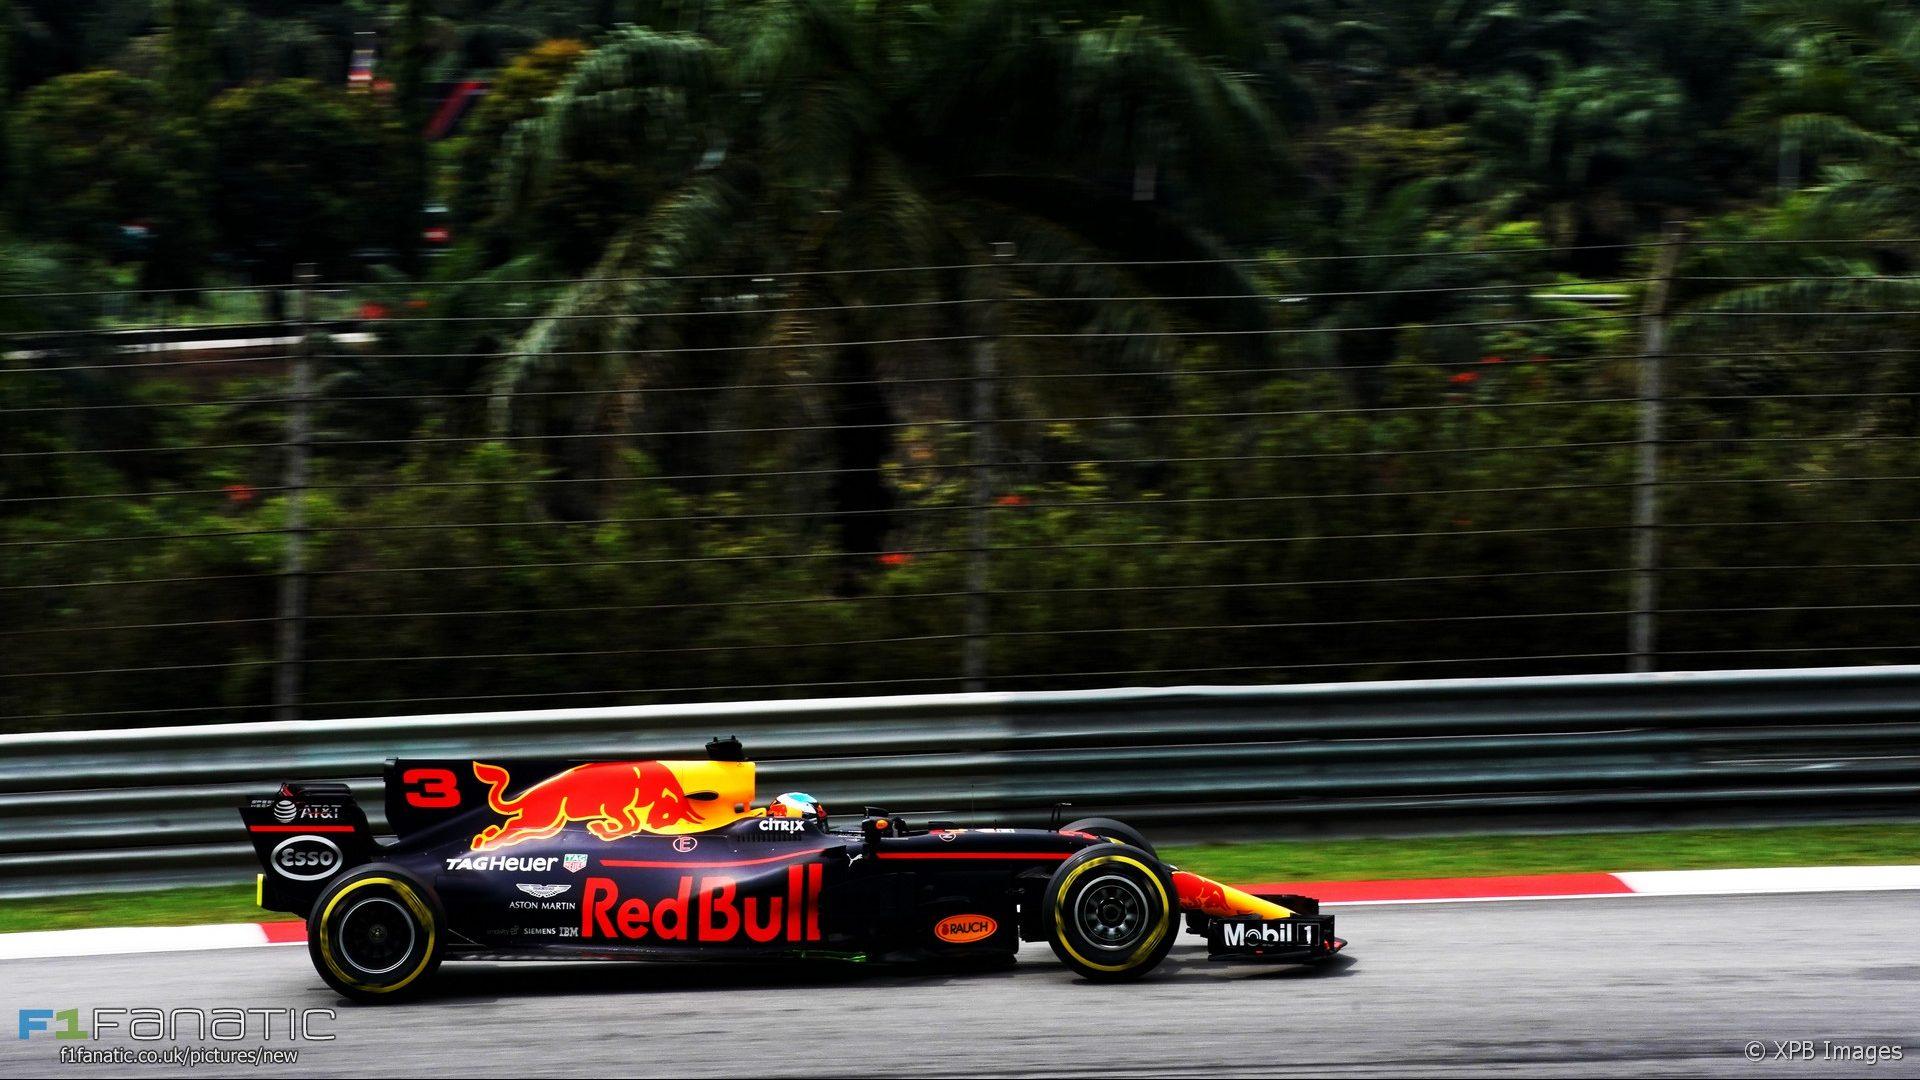 F1 2017: PETRONAS MALAYSIA GRAND PRIX Round 15 - BMW 3